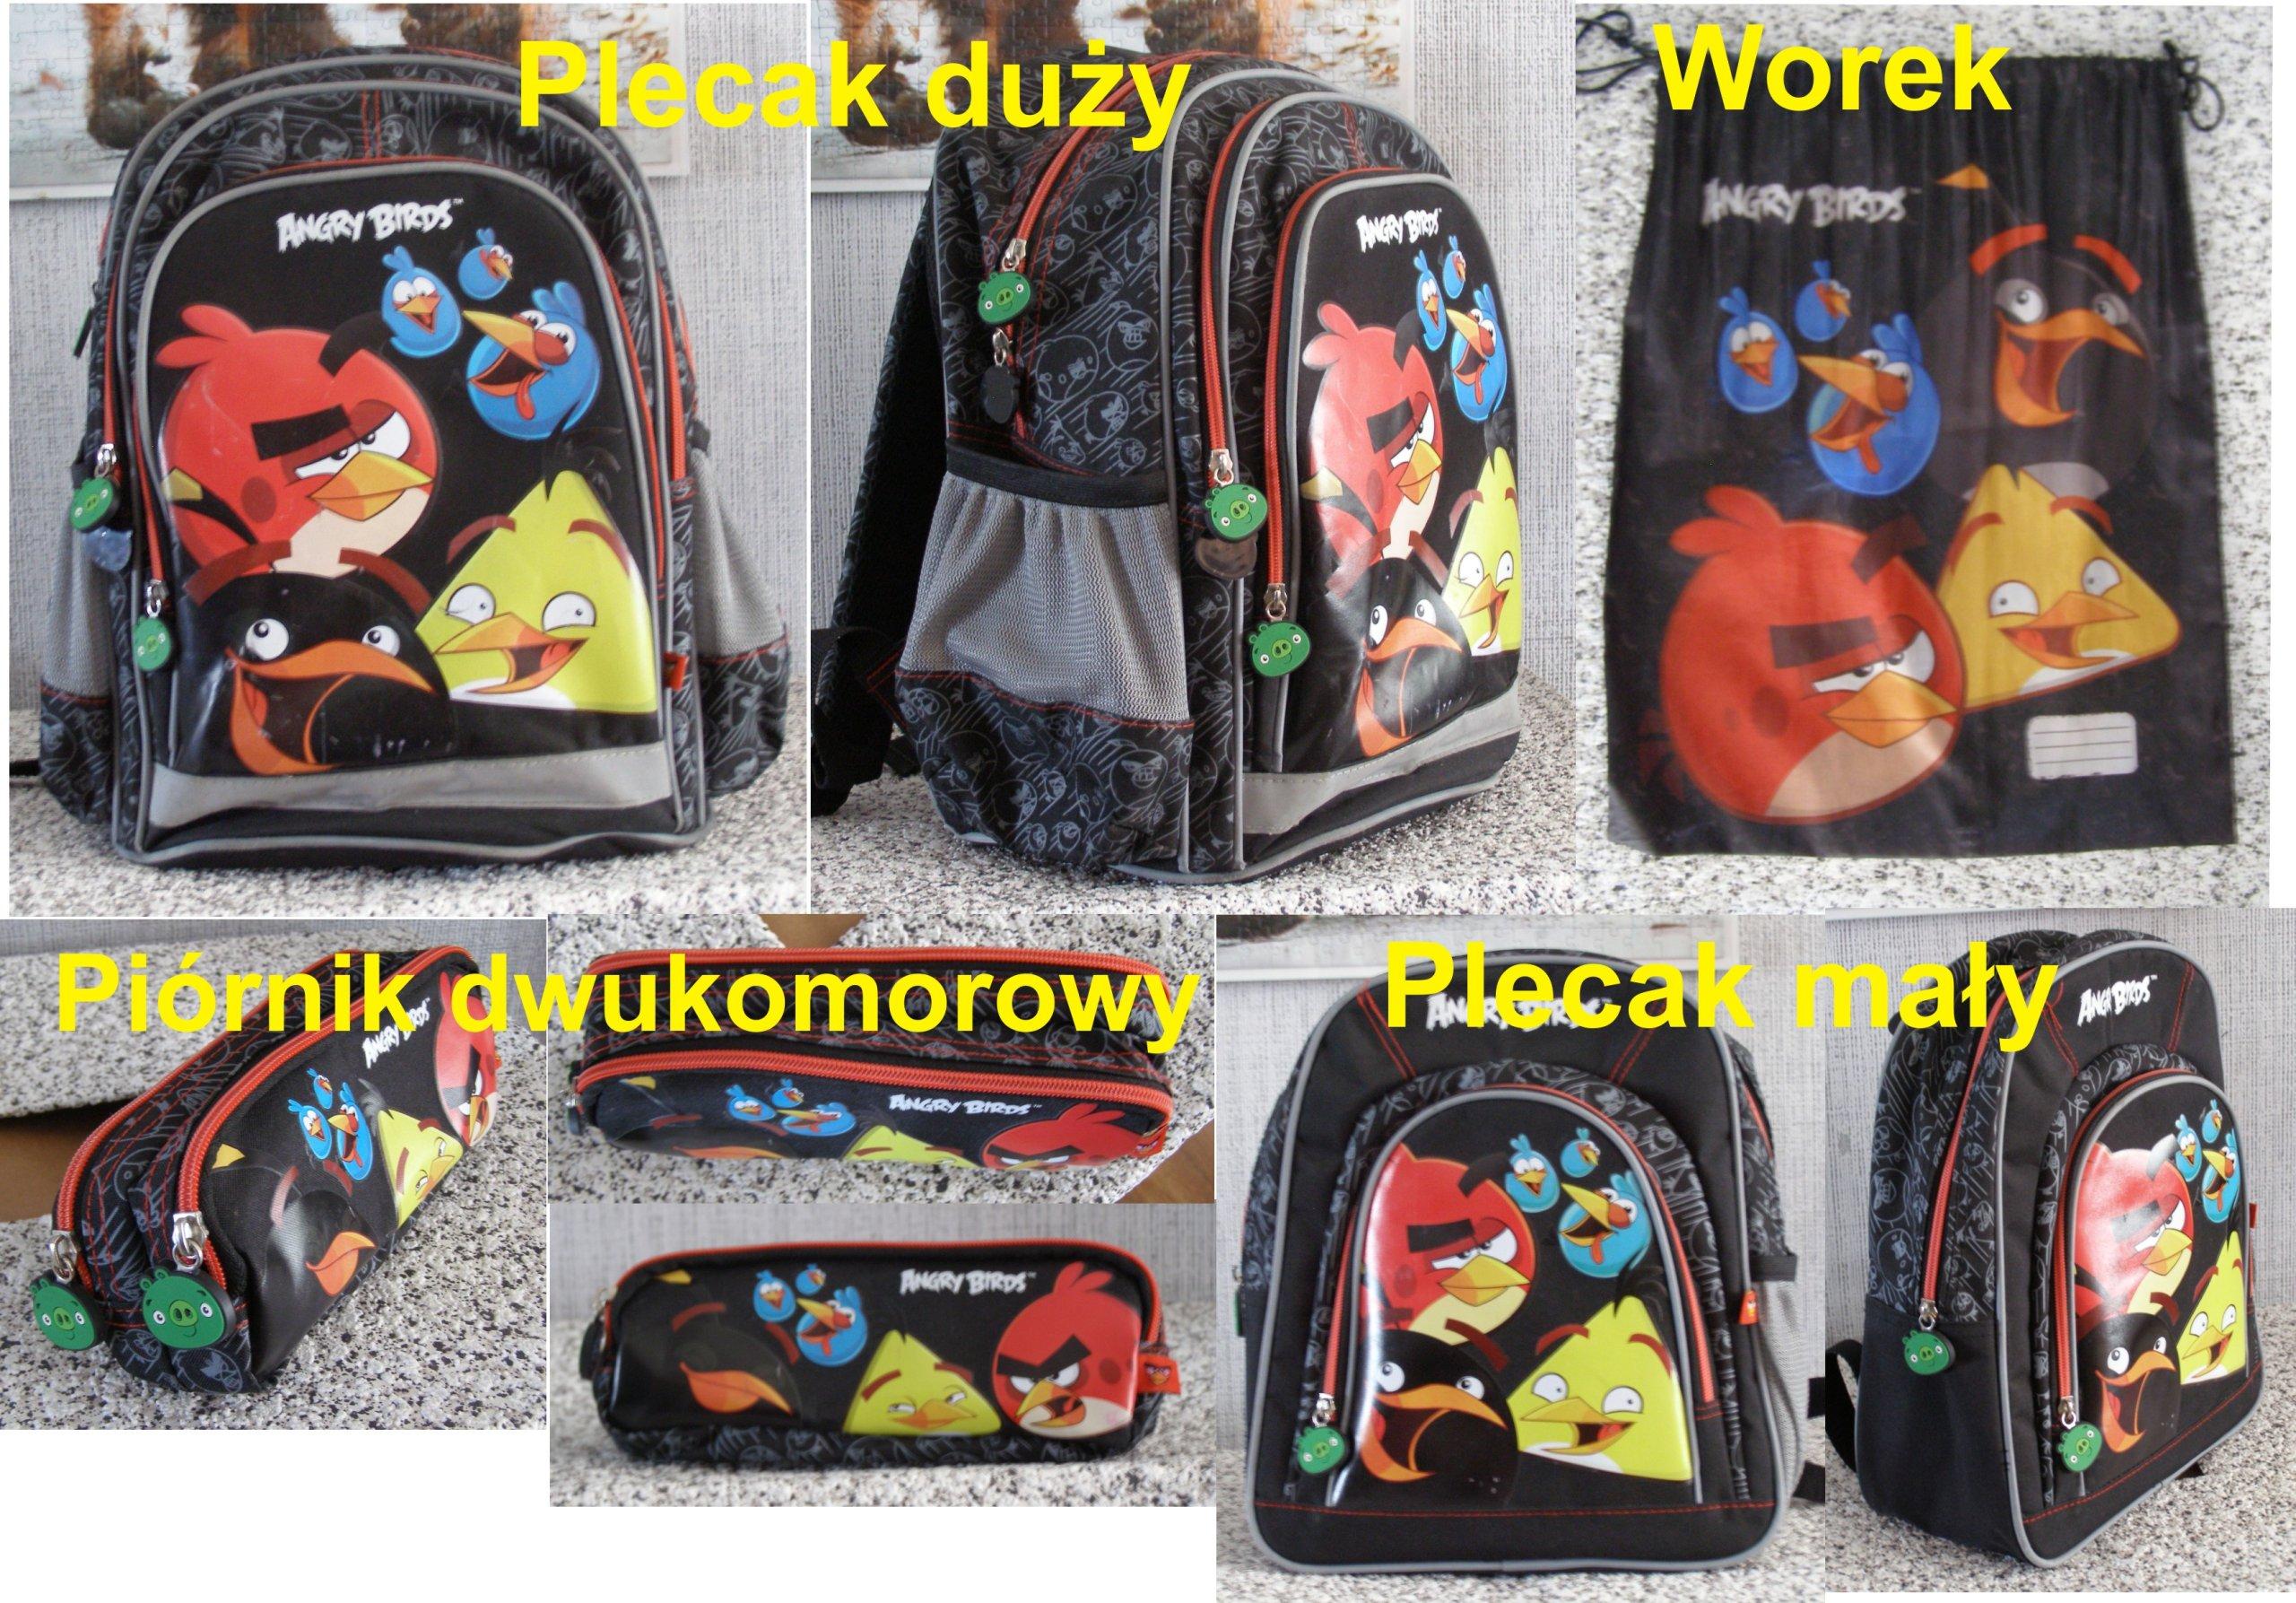 21fab294c2820 ... Plecak szkolny Angry Birds Star Wars GRATIS. PLECAK ANGRY BIRDS +++